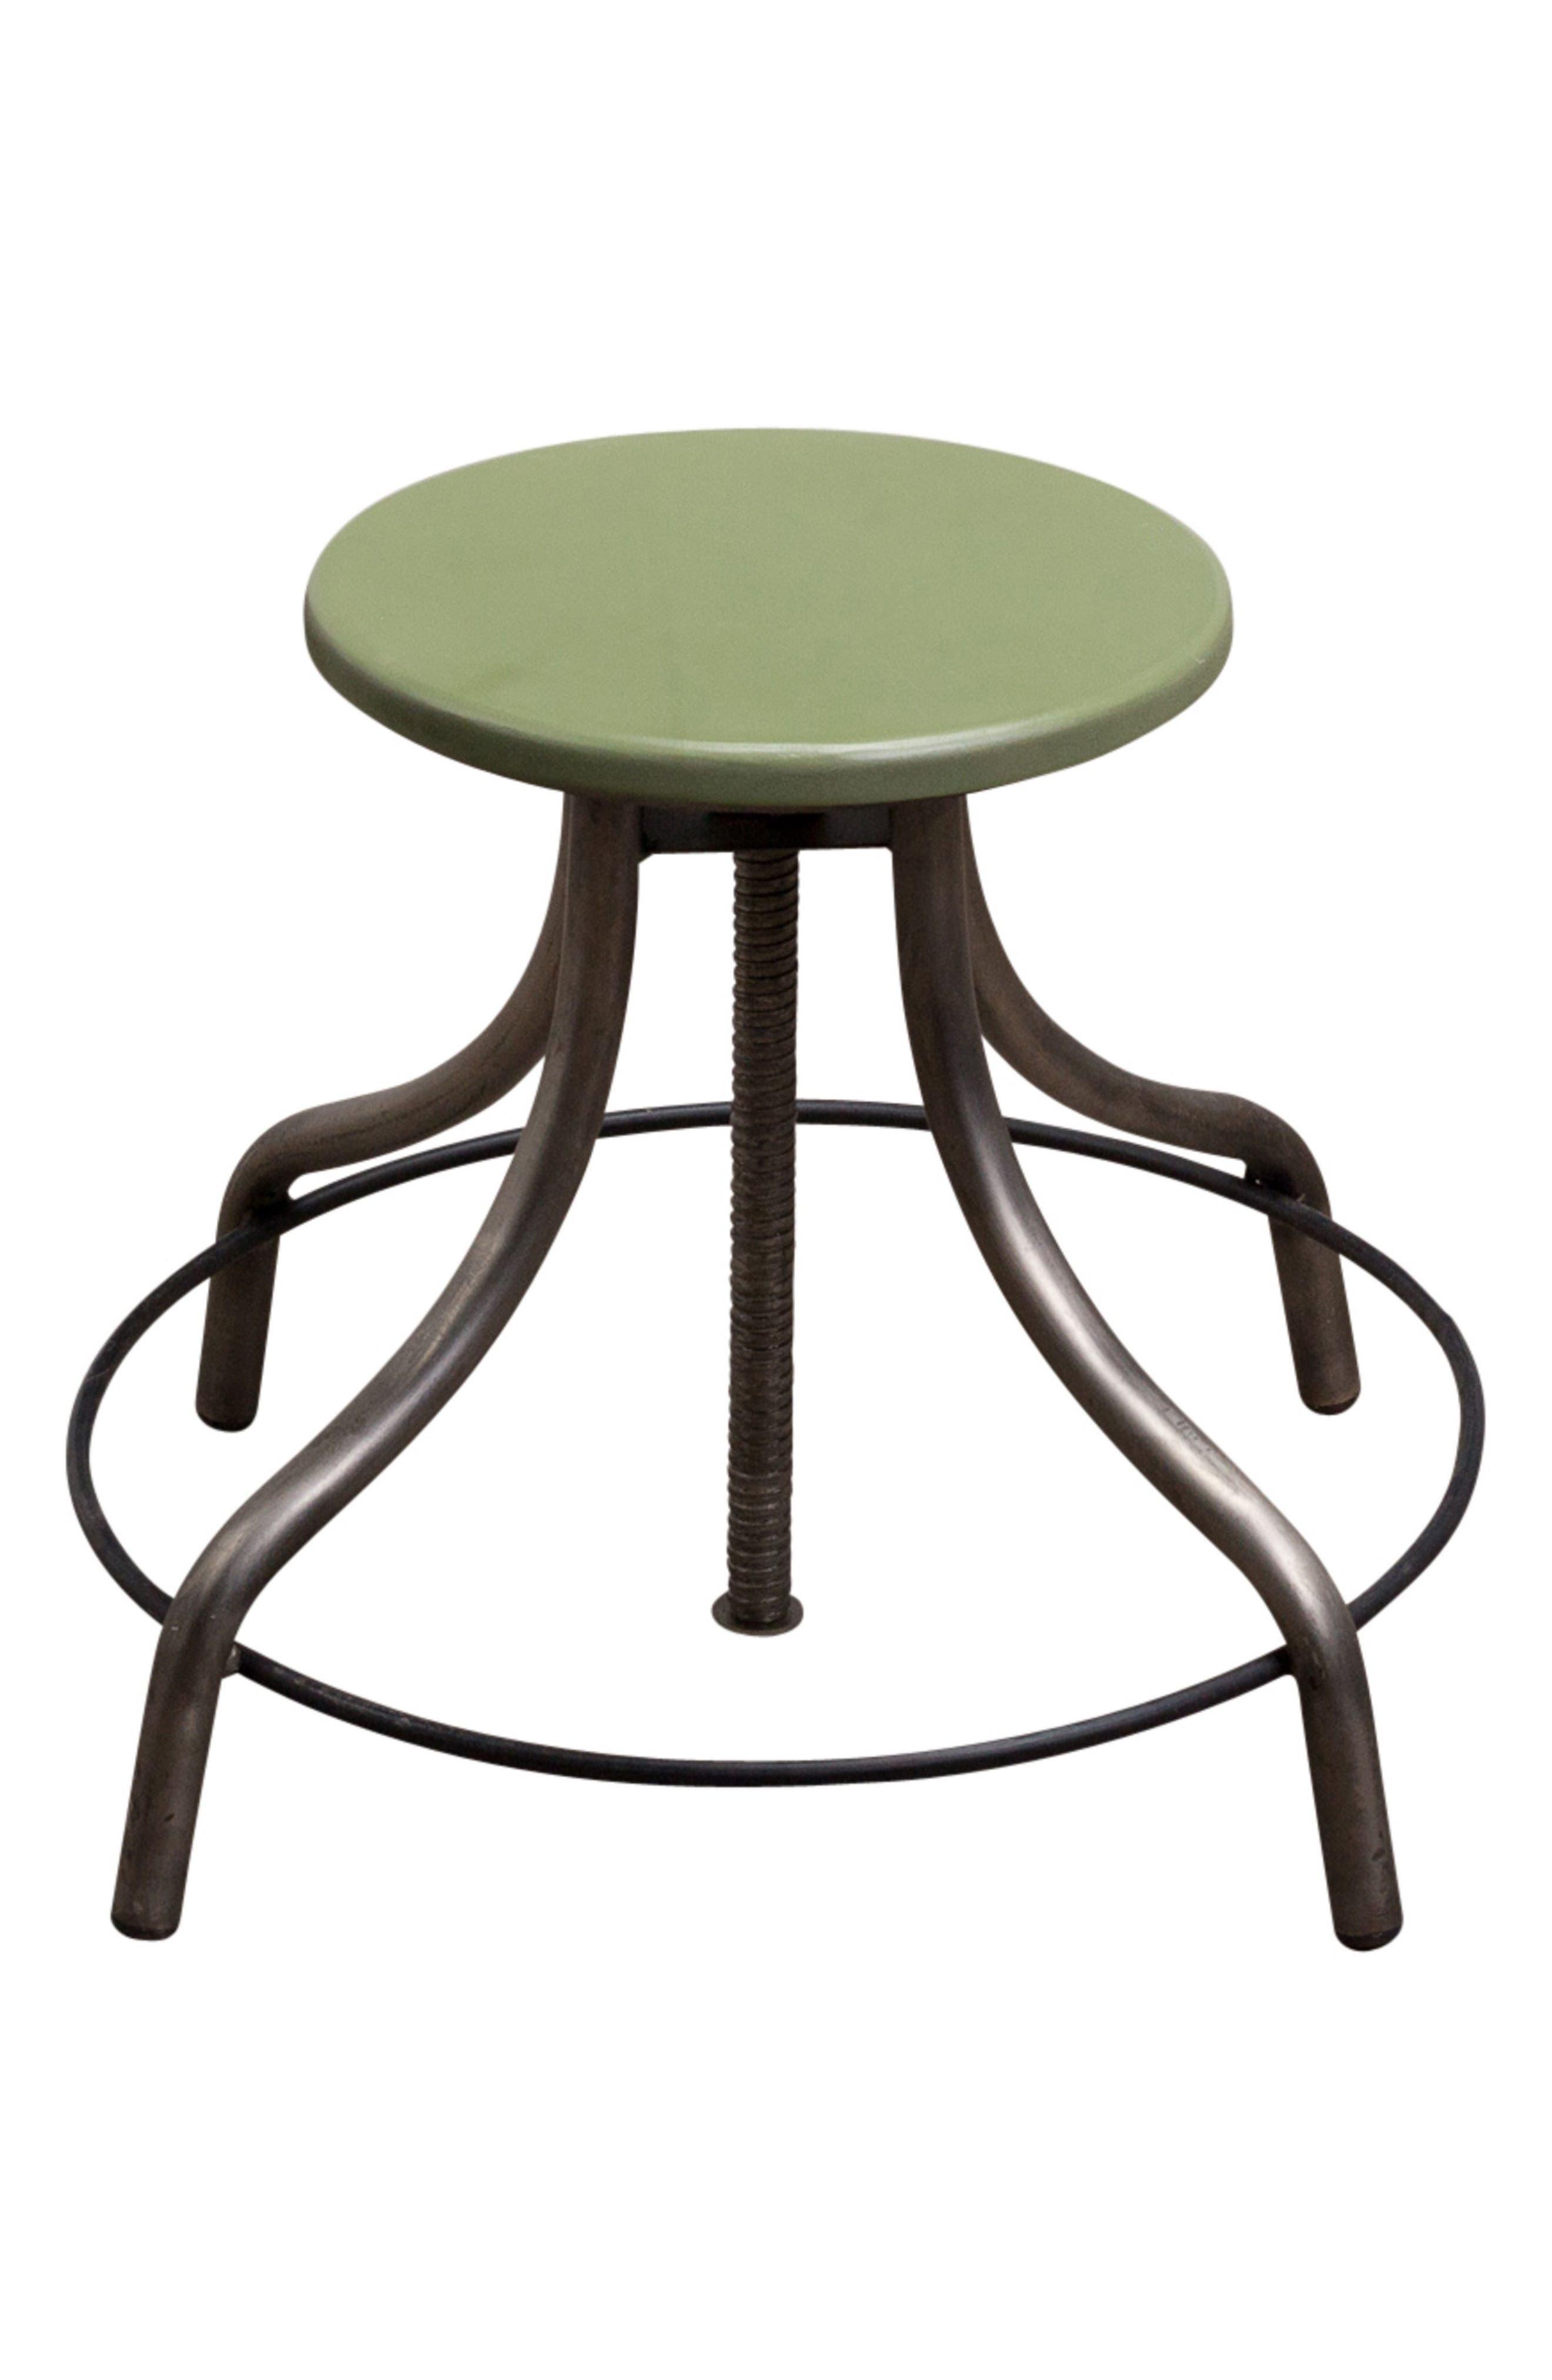 Factory Twist Stool,                             Alternate thumbnail 2, color,                             Green Patina Steel